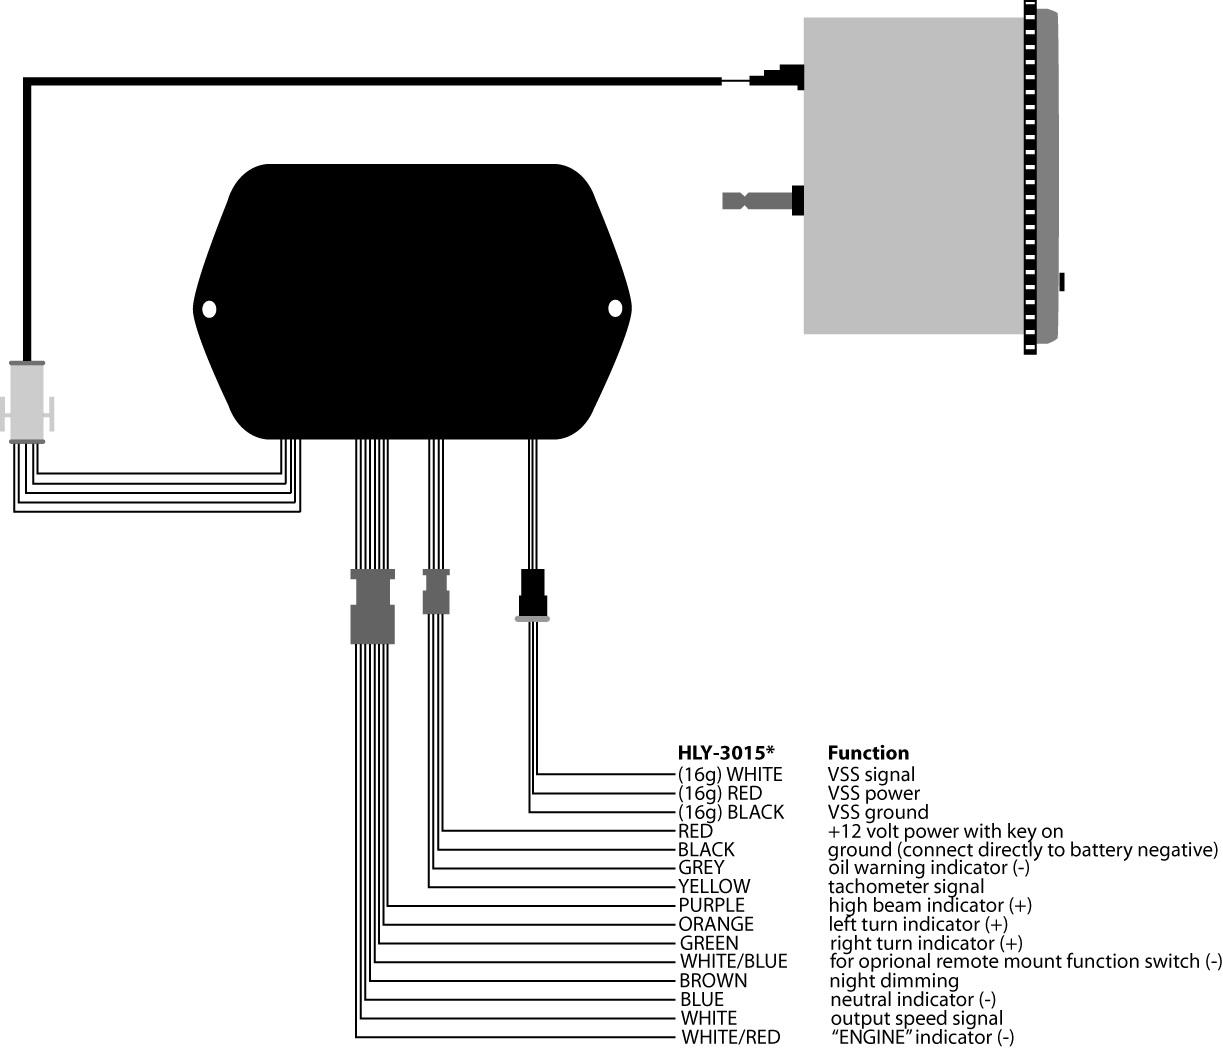 tpi engine wiring diagram tpi image wiring diagram tpi wiring diagram tpi image wiring diagram on tpi engine wiring diagram